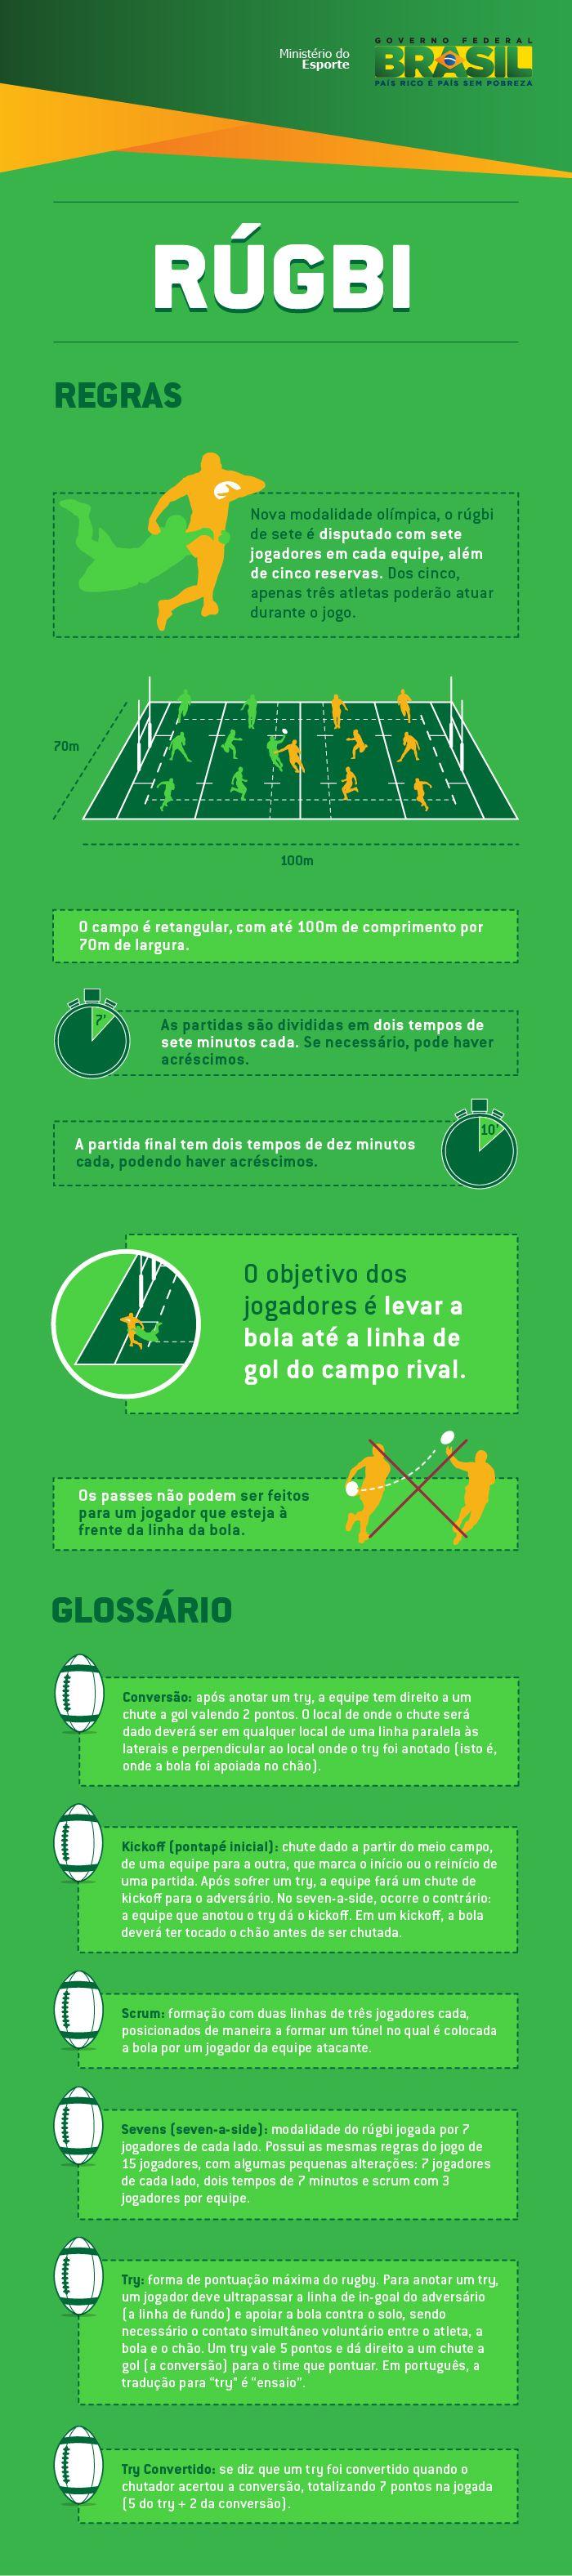 Rúgbi — Portal Brasil 2016